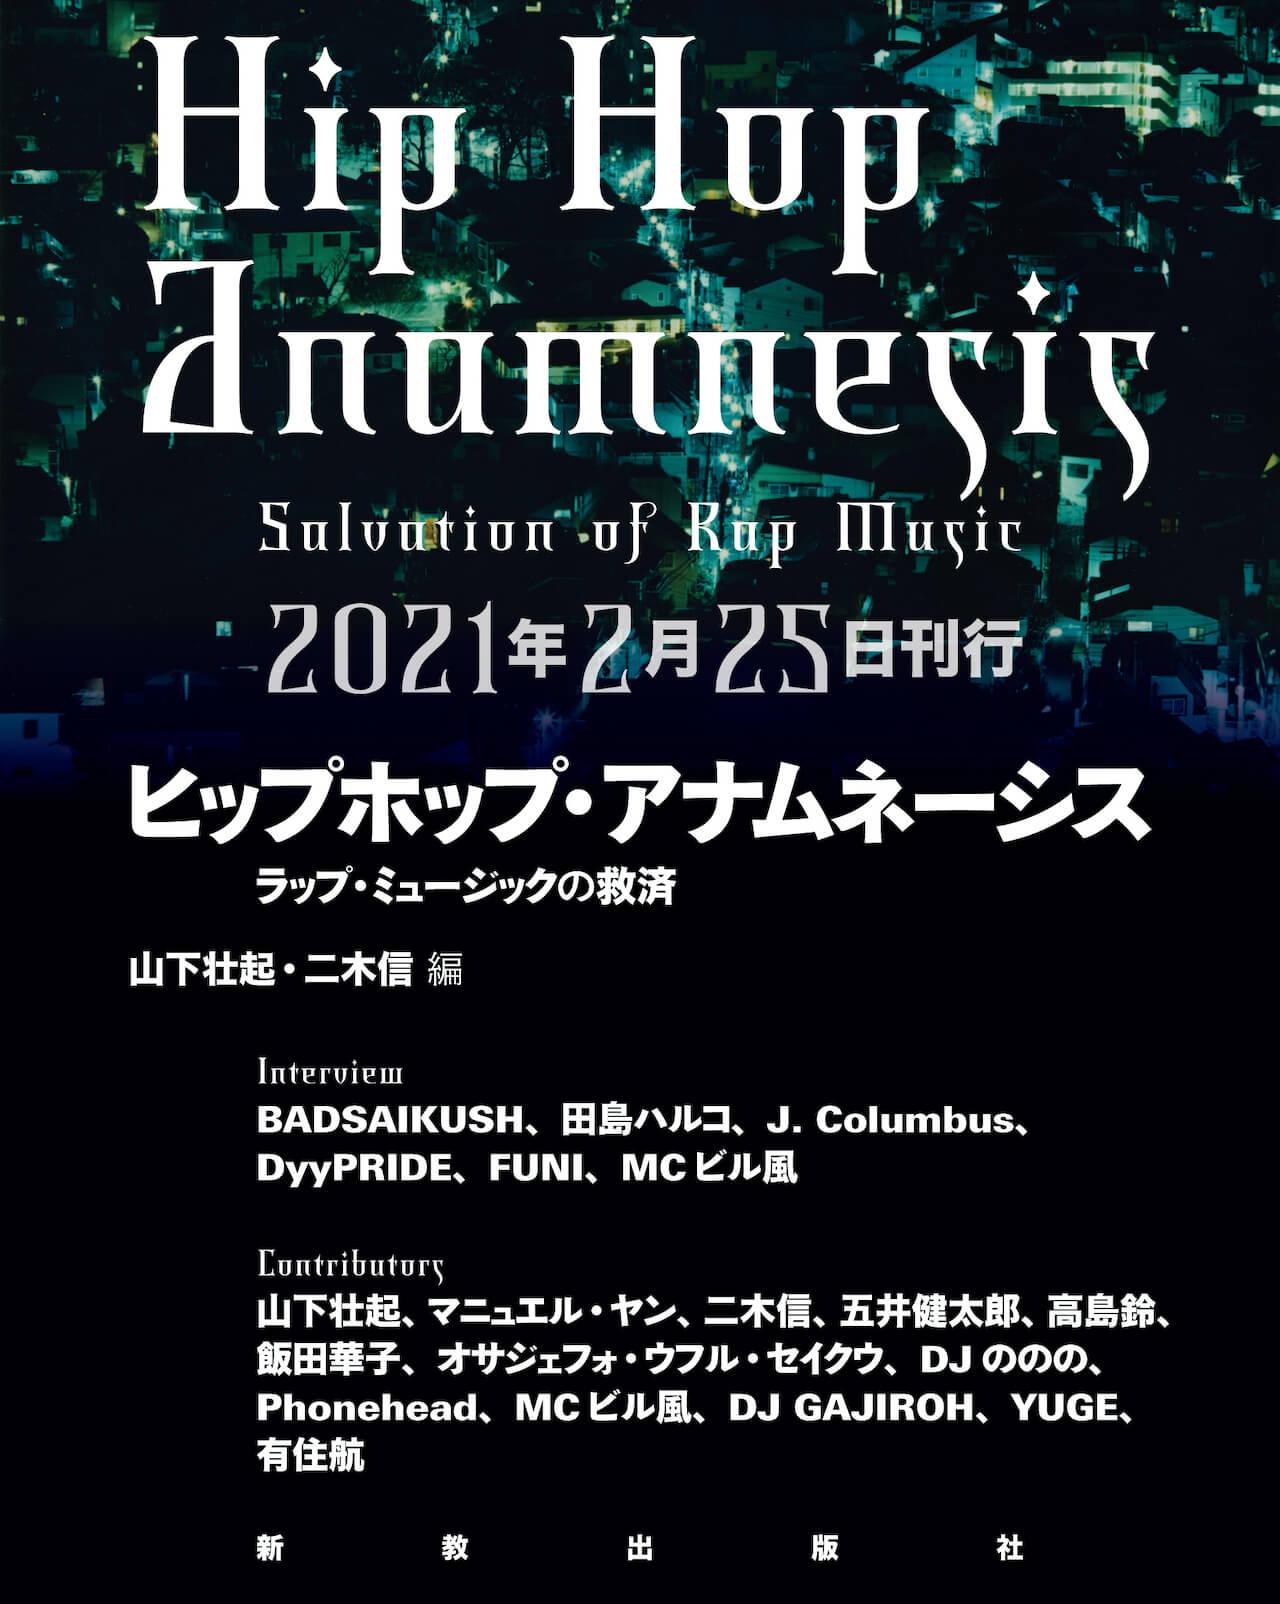 BADSAIKUSH、田島ハルコ、J. Columbus、DyyPRIDEらのインタビューが掲載!書籍『ヒップホップ・アナムネーシス――ラップ・ミュージックの救済』が2021年2月に刊行 music201215-salvationofrapmusic